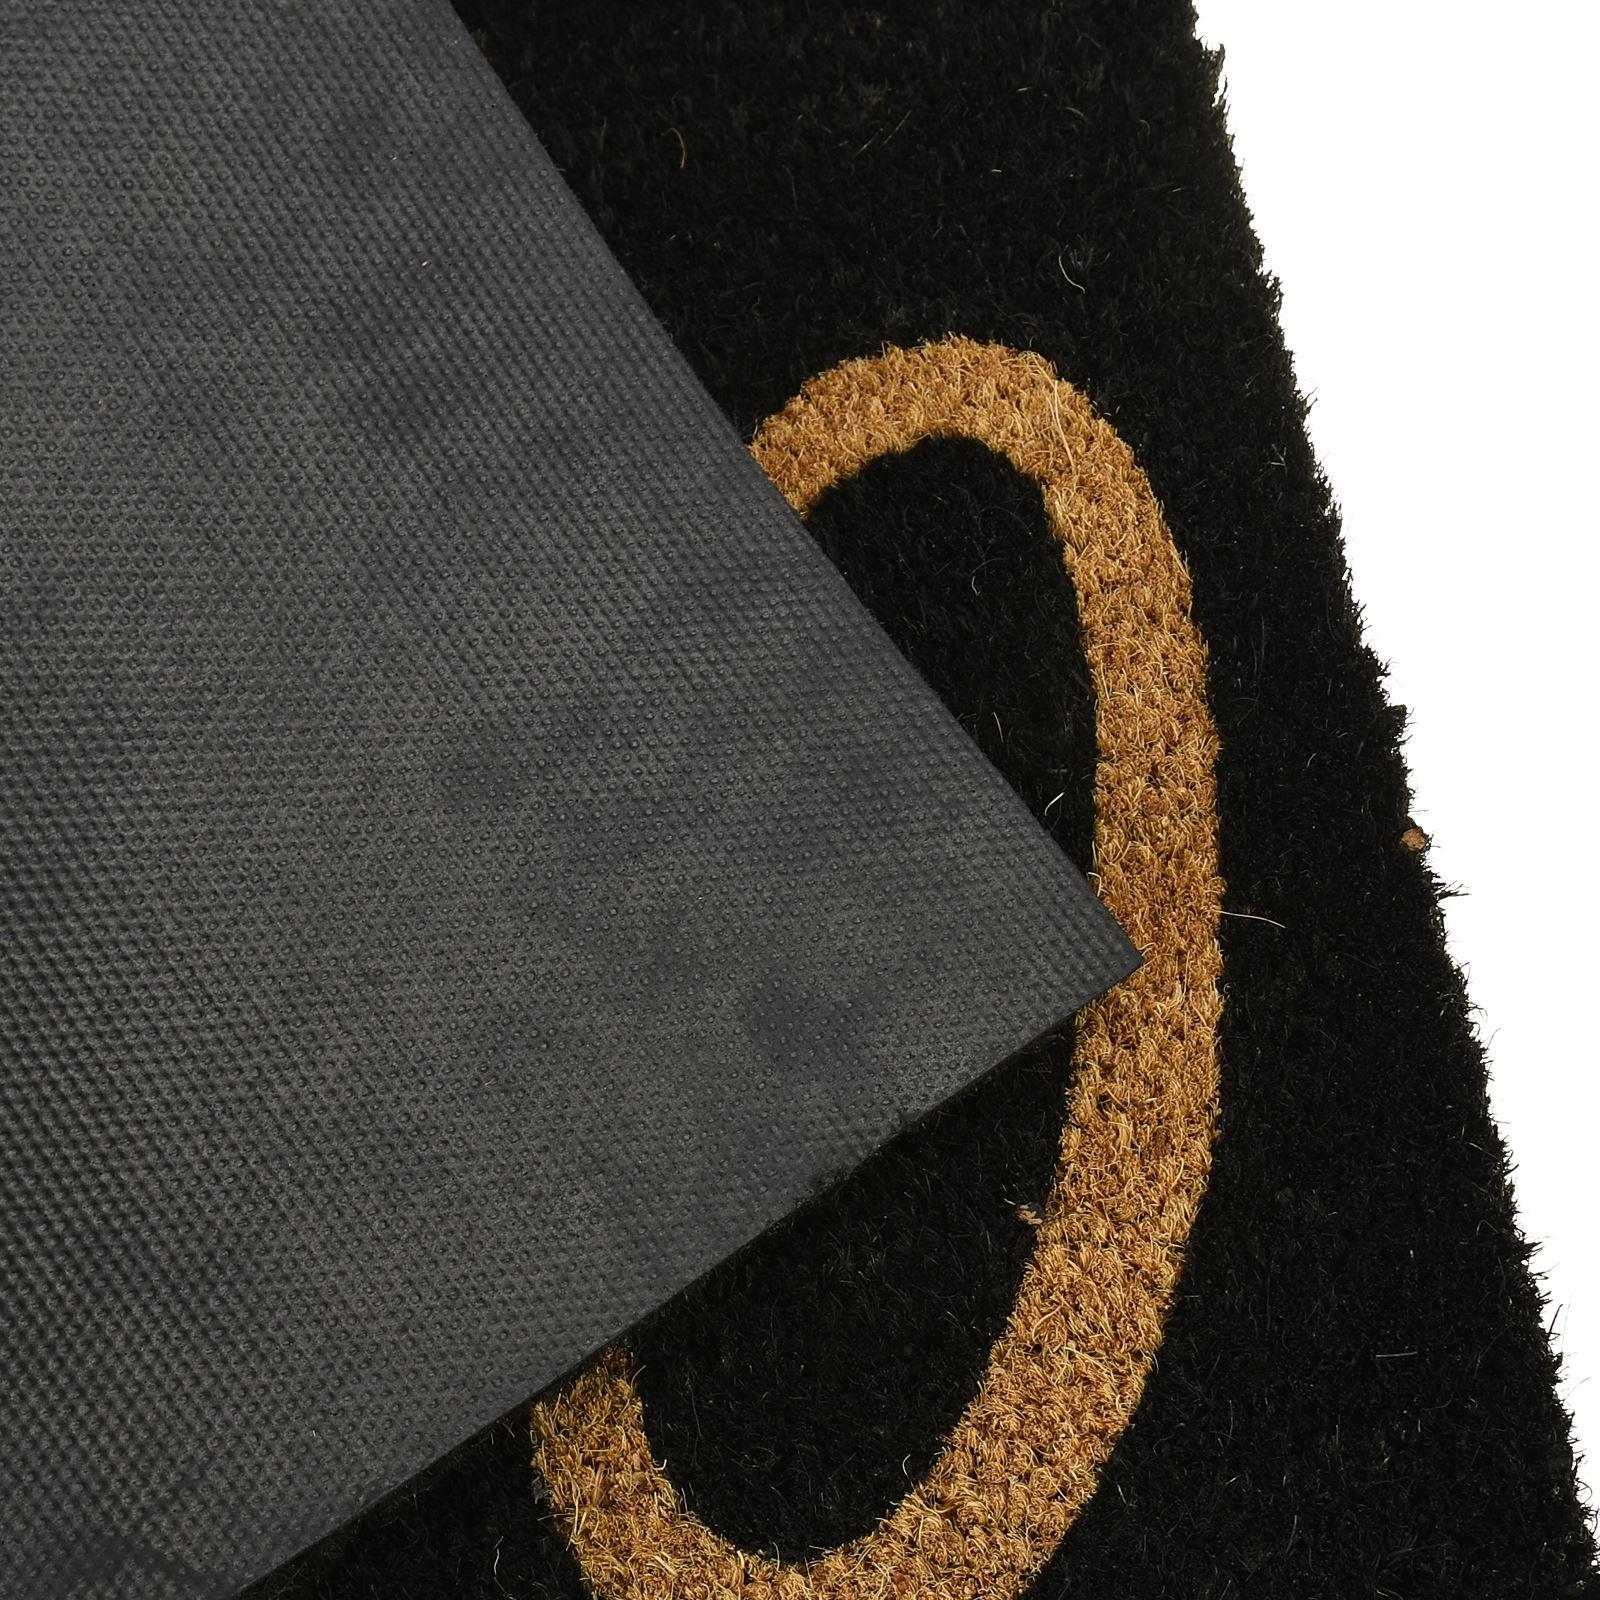 Plain-Non-Slip-Door-Mat-Tough-Natural-Coir-PVC-Back-Welcome-Doormat-40-x-60cm miniatura 56